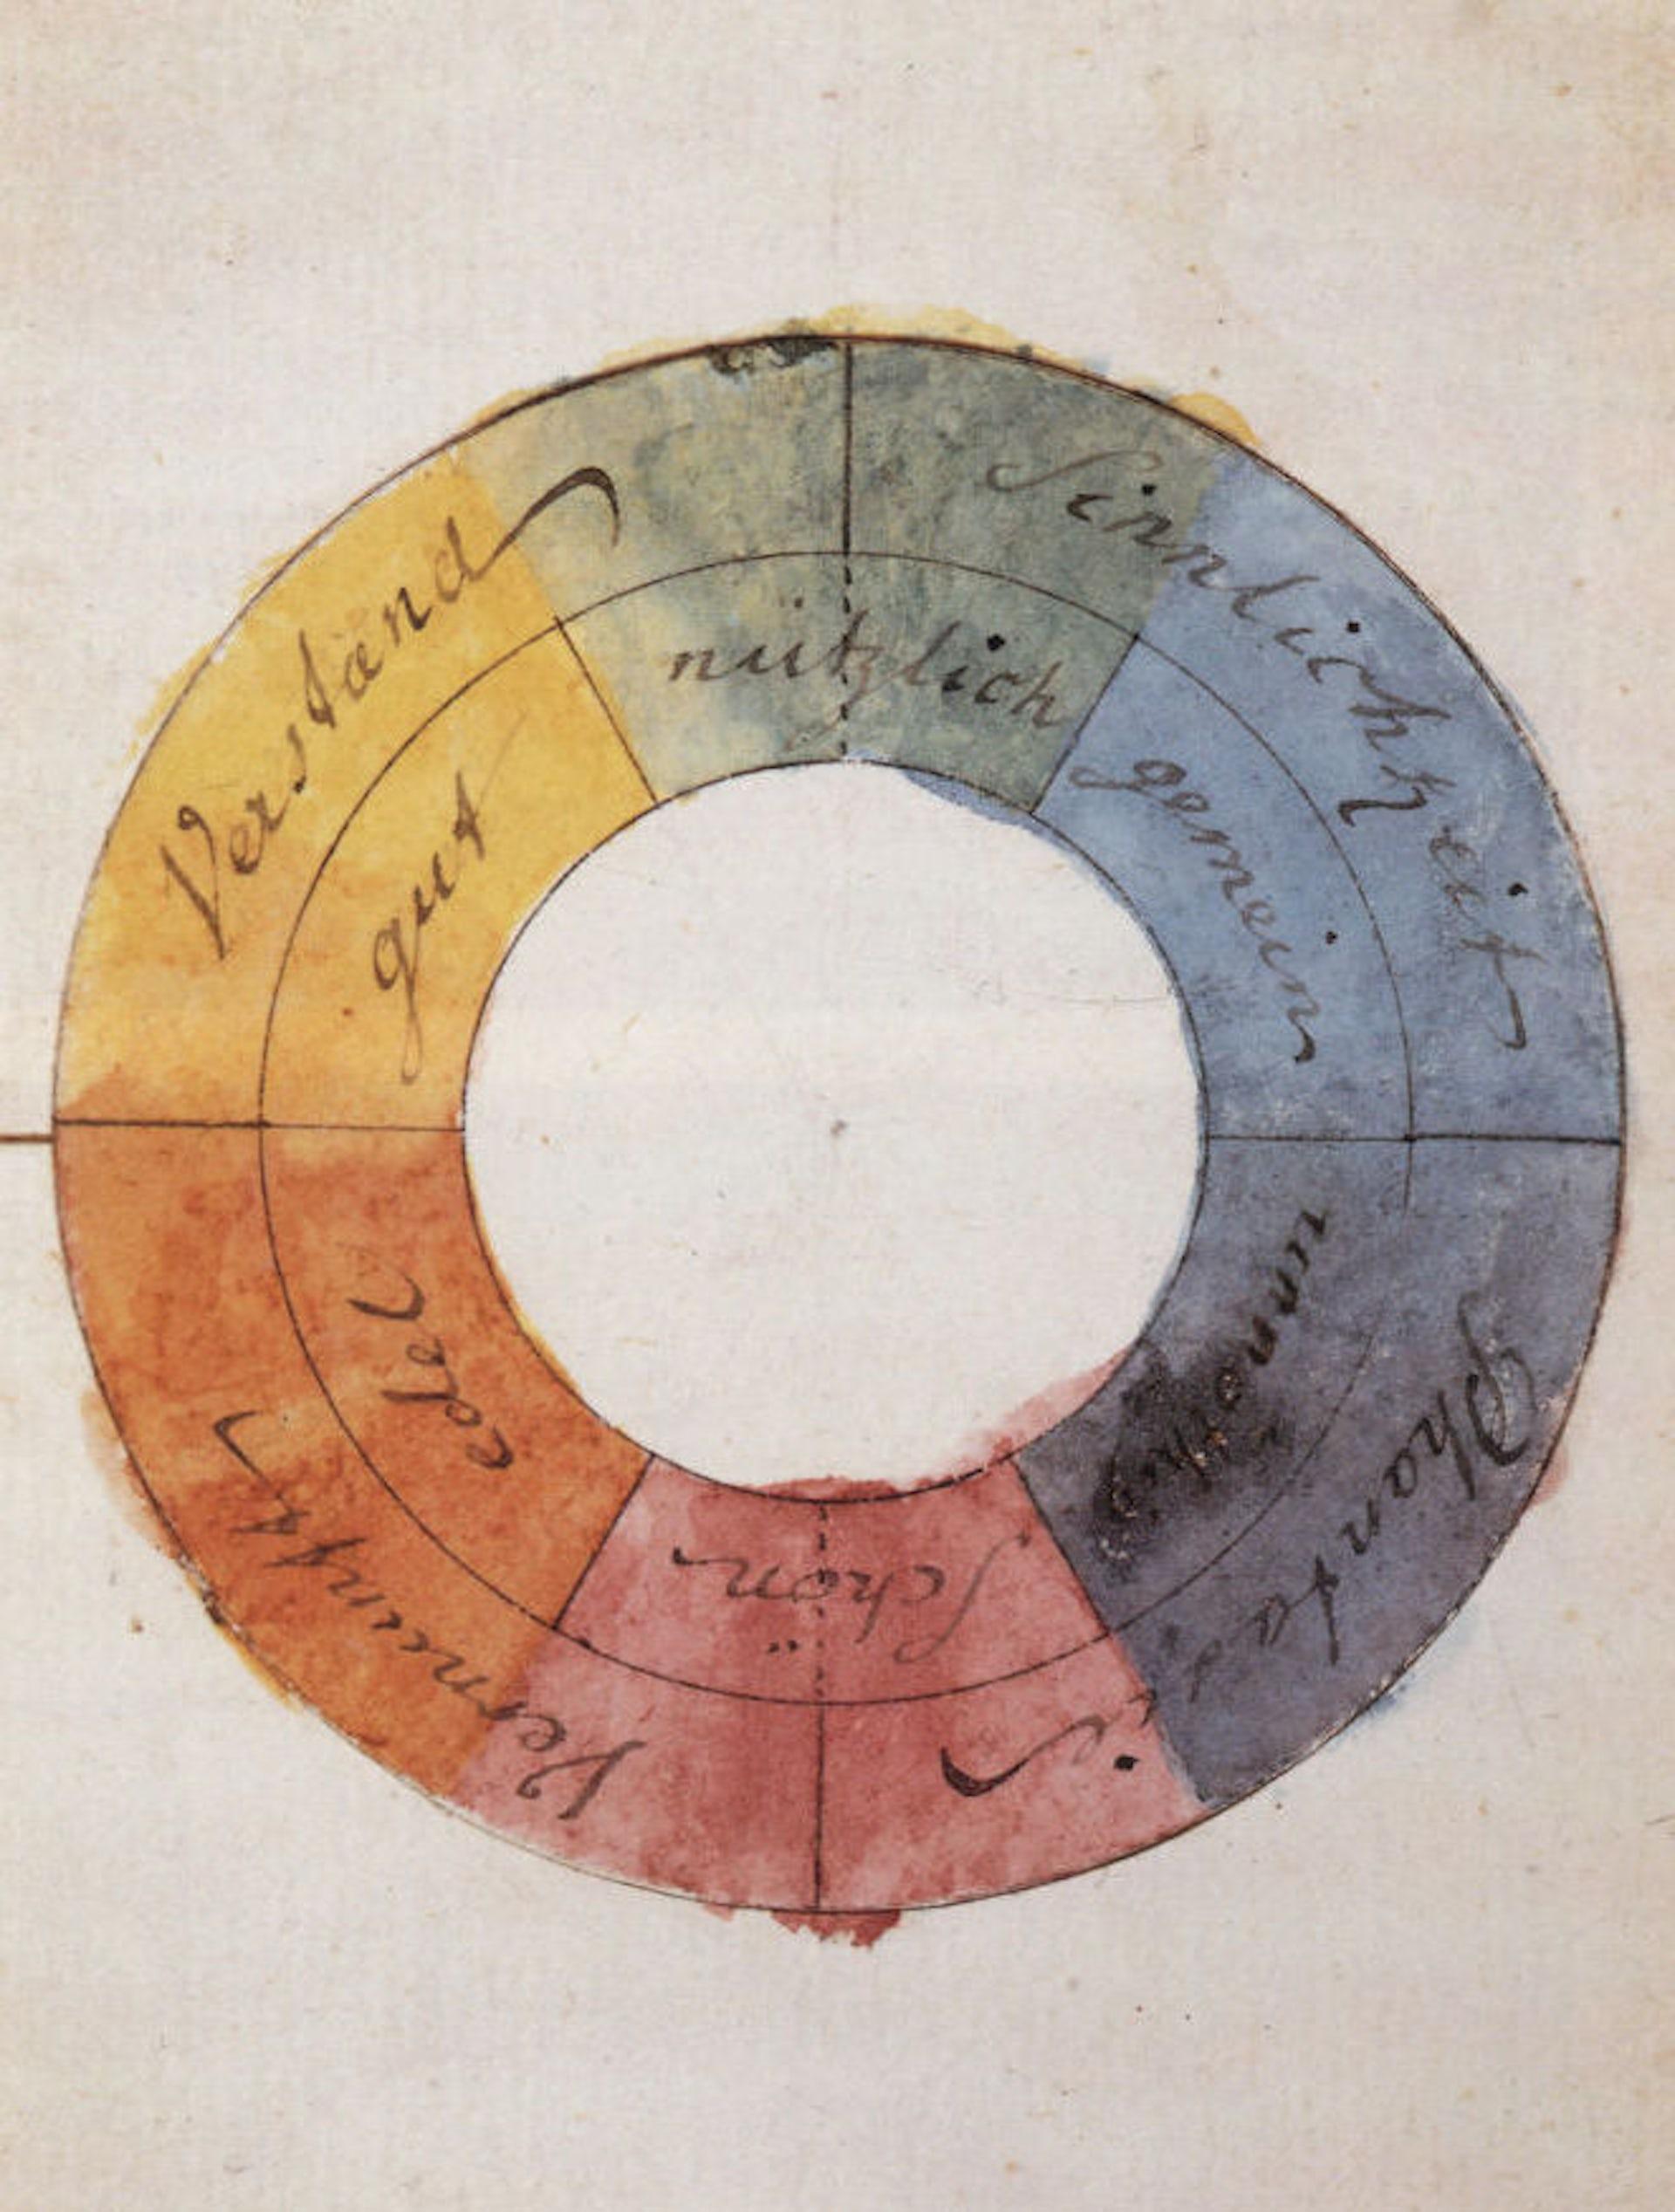 The color wheel.